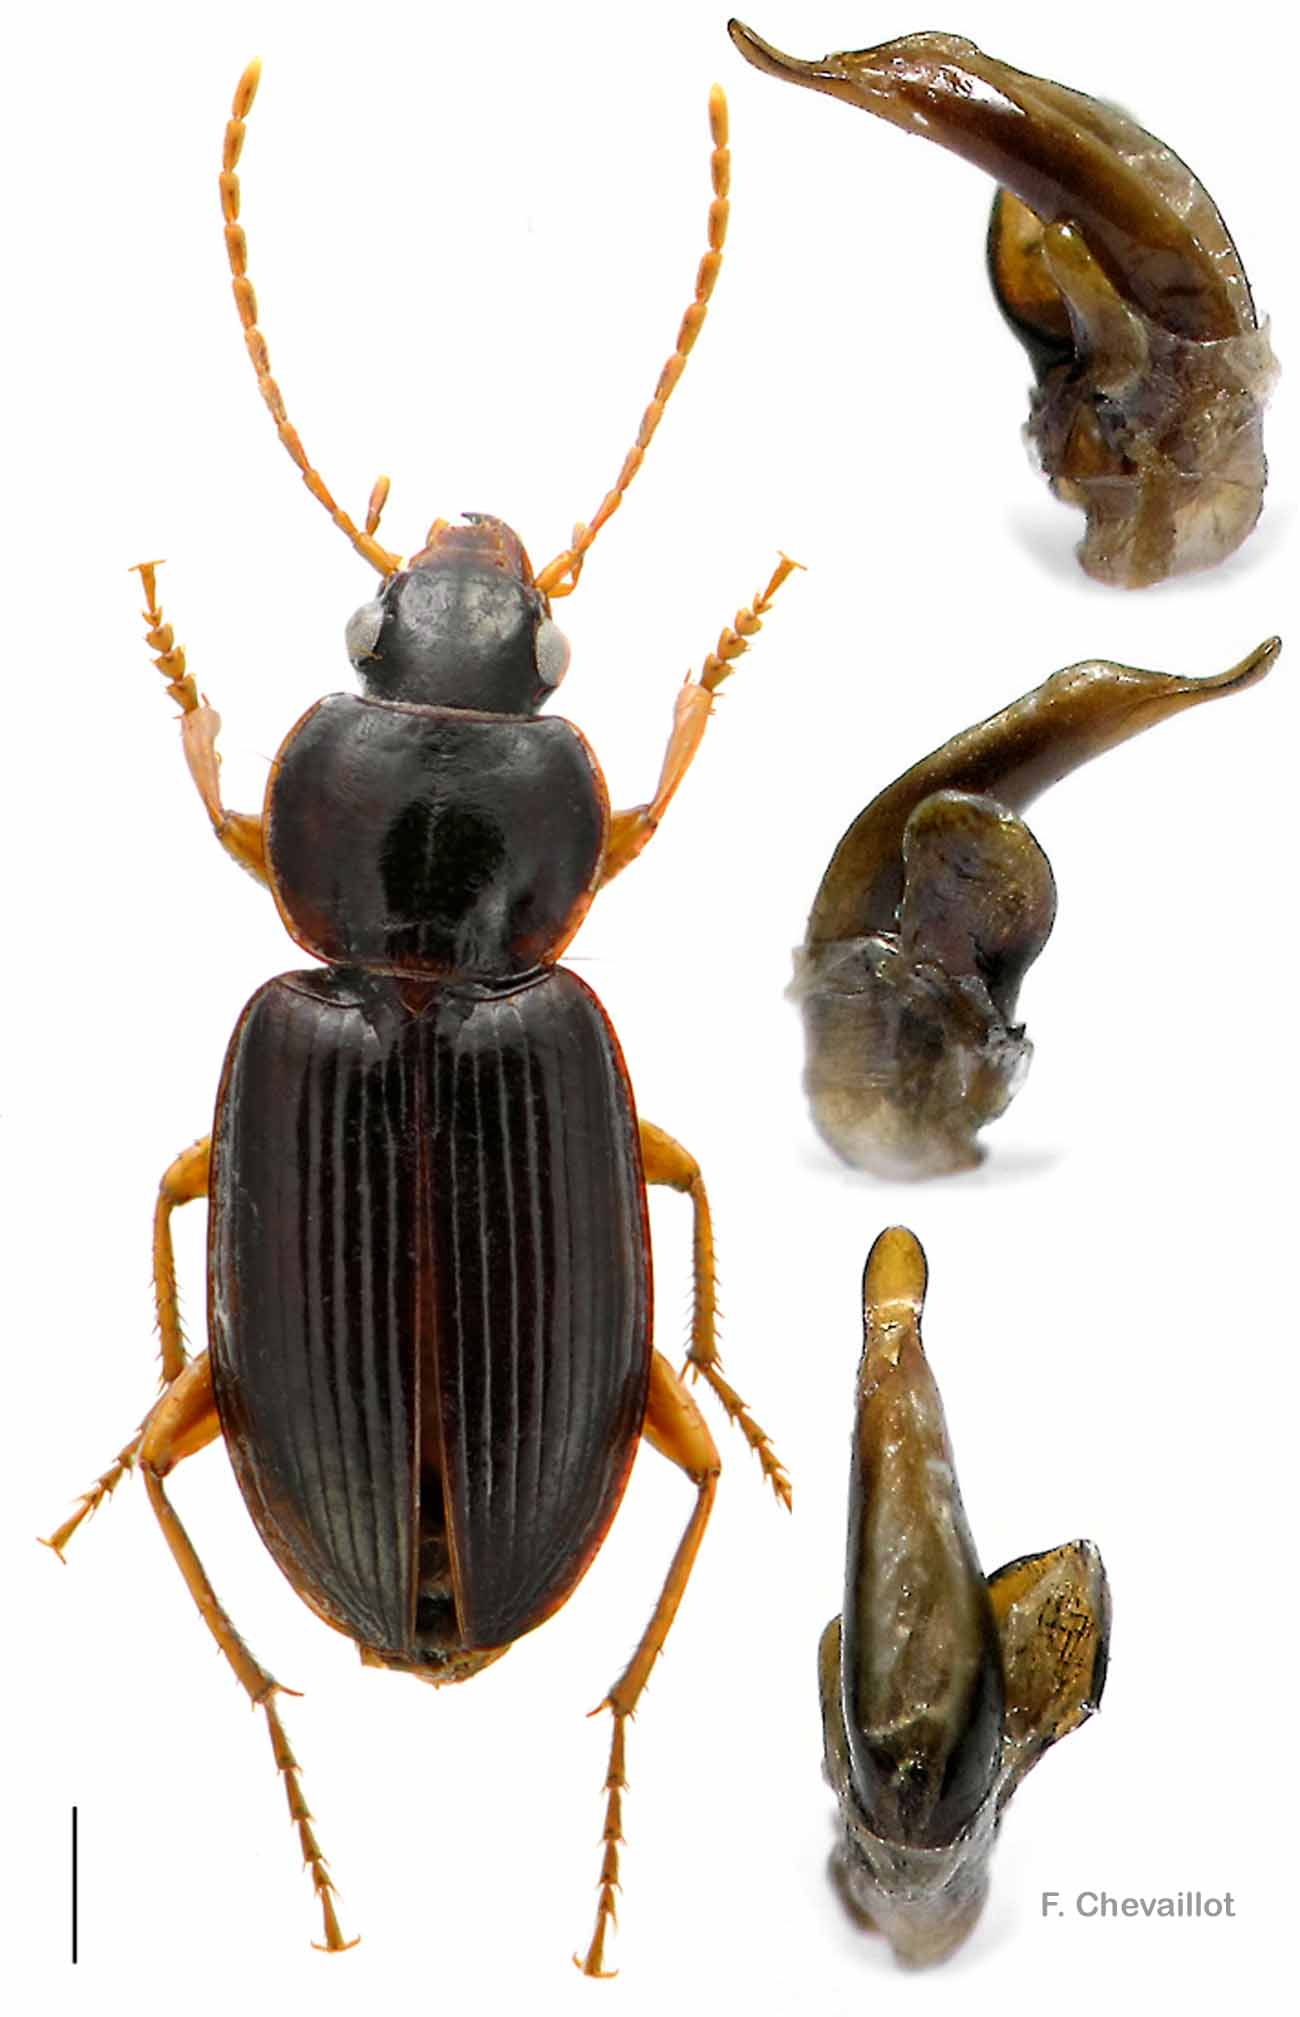 Synuchus vivalis